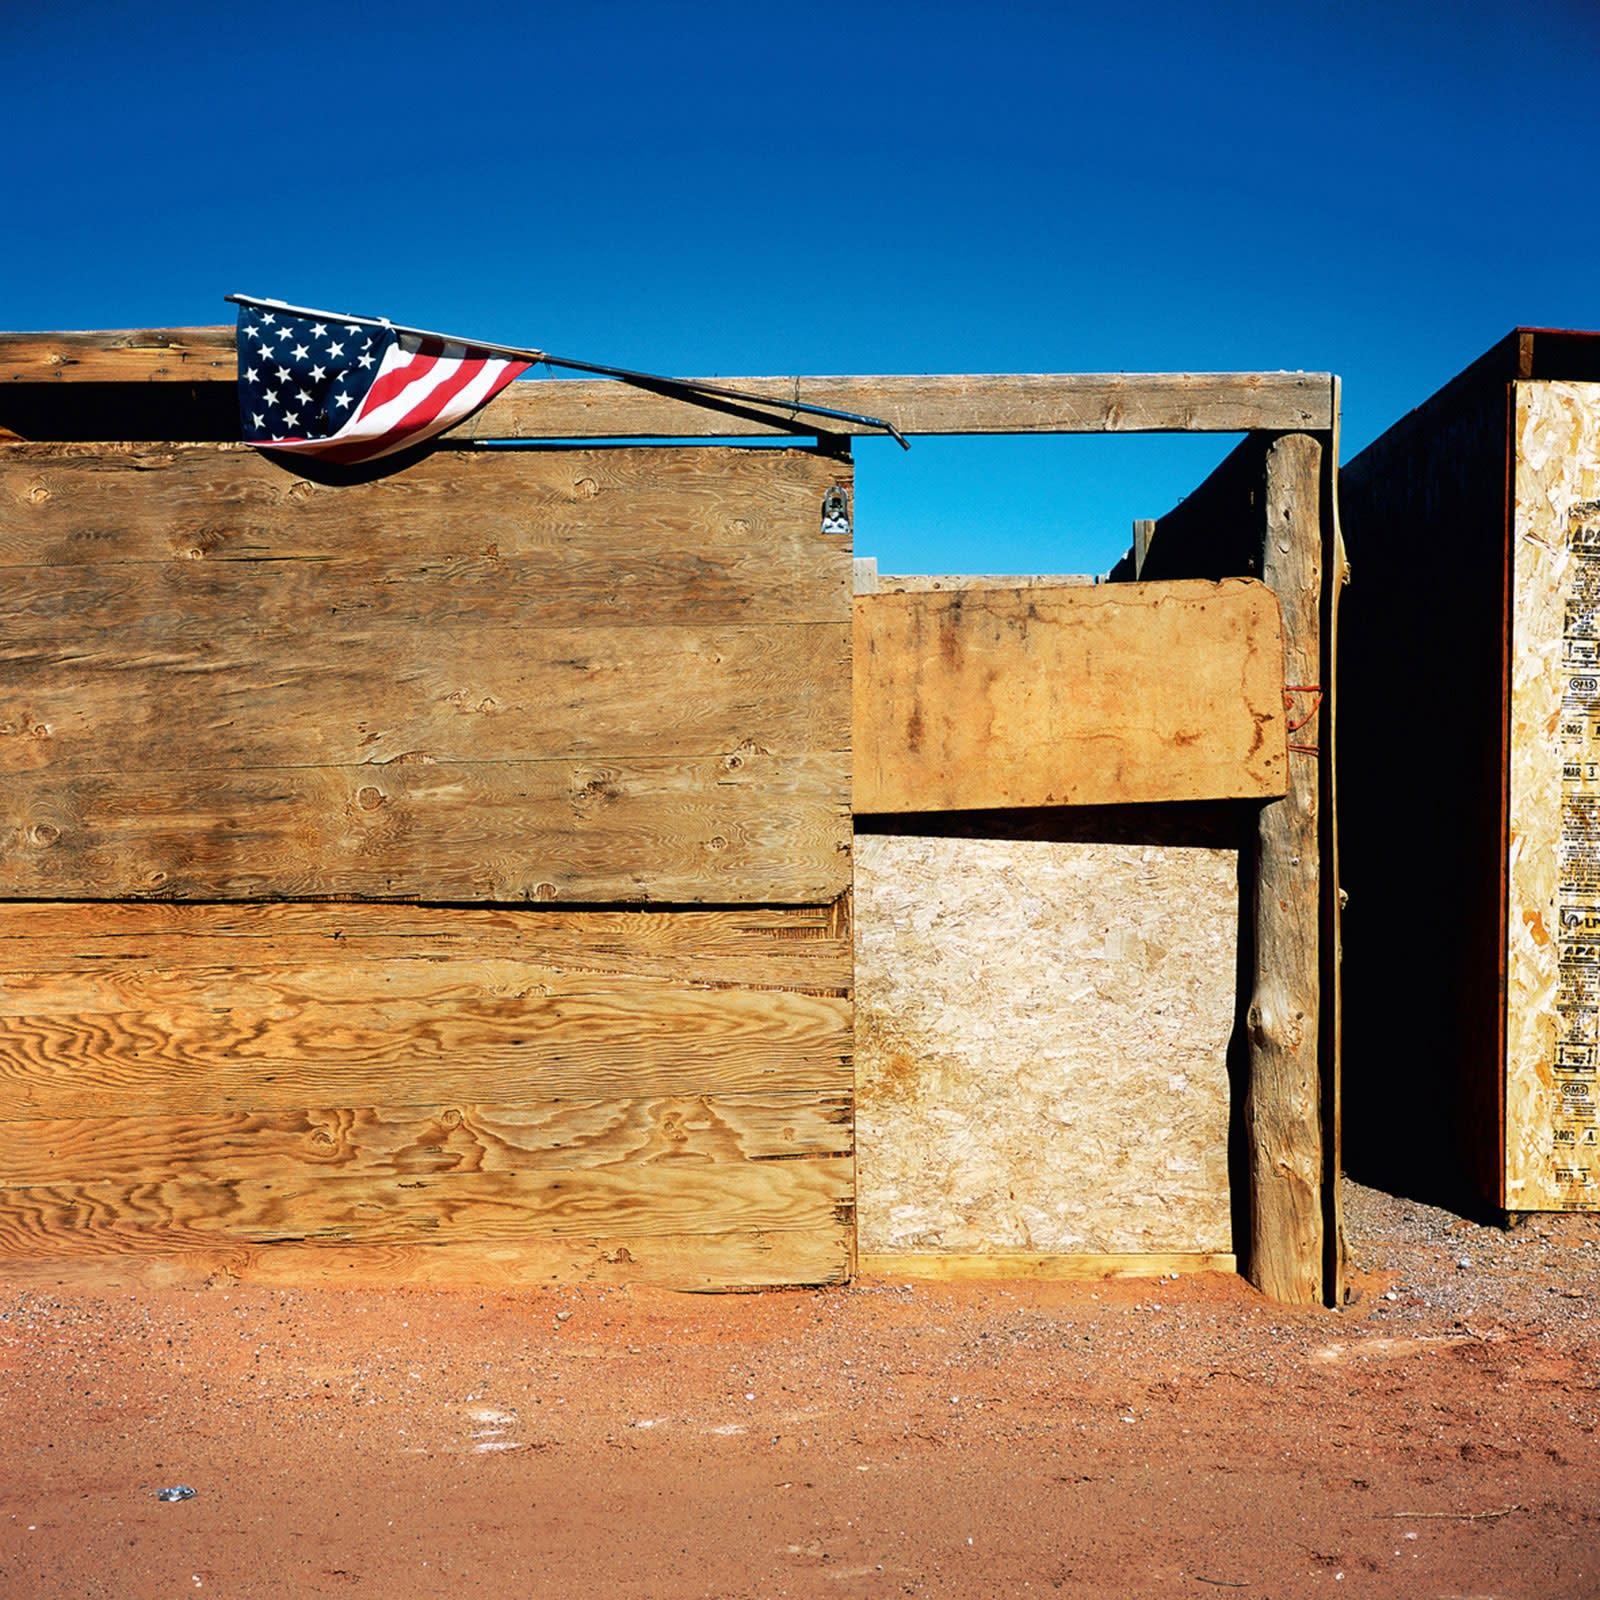 Jean-Christophe Béchet, Monument Valley, Arizona, 2004